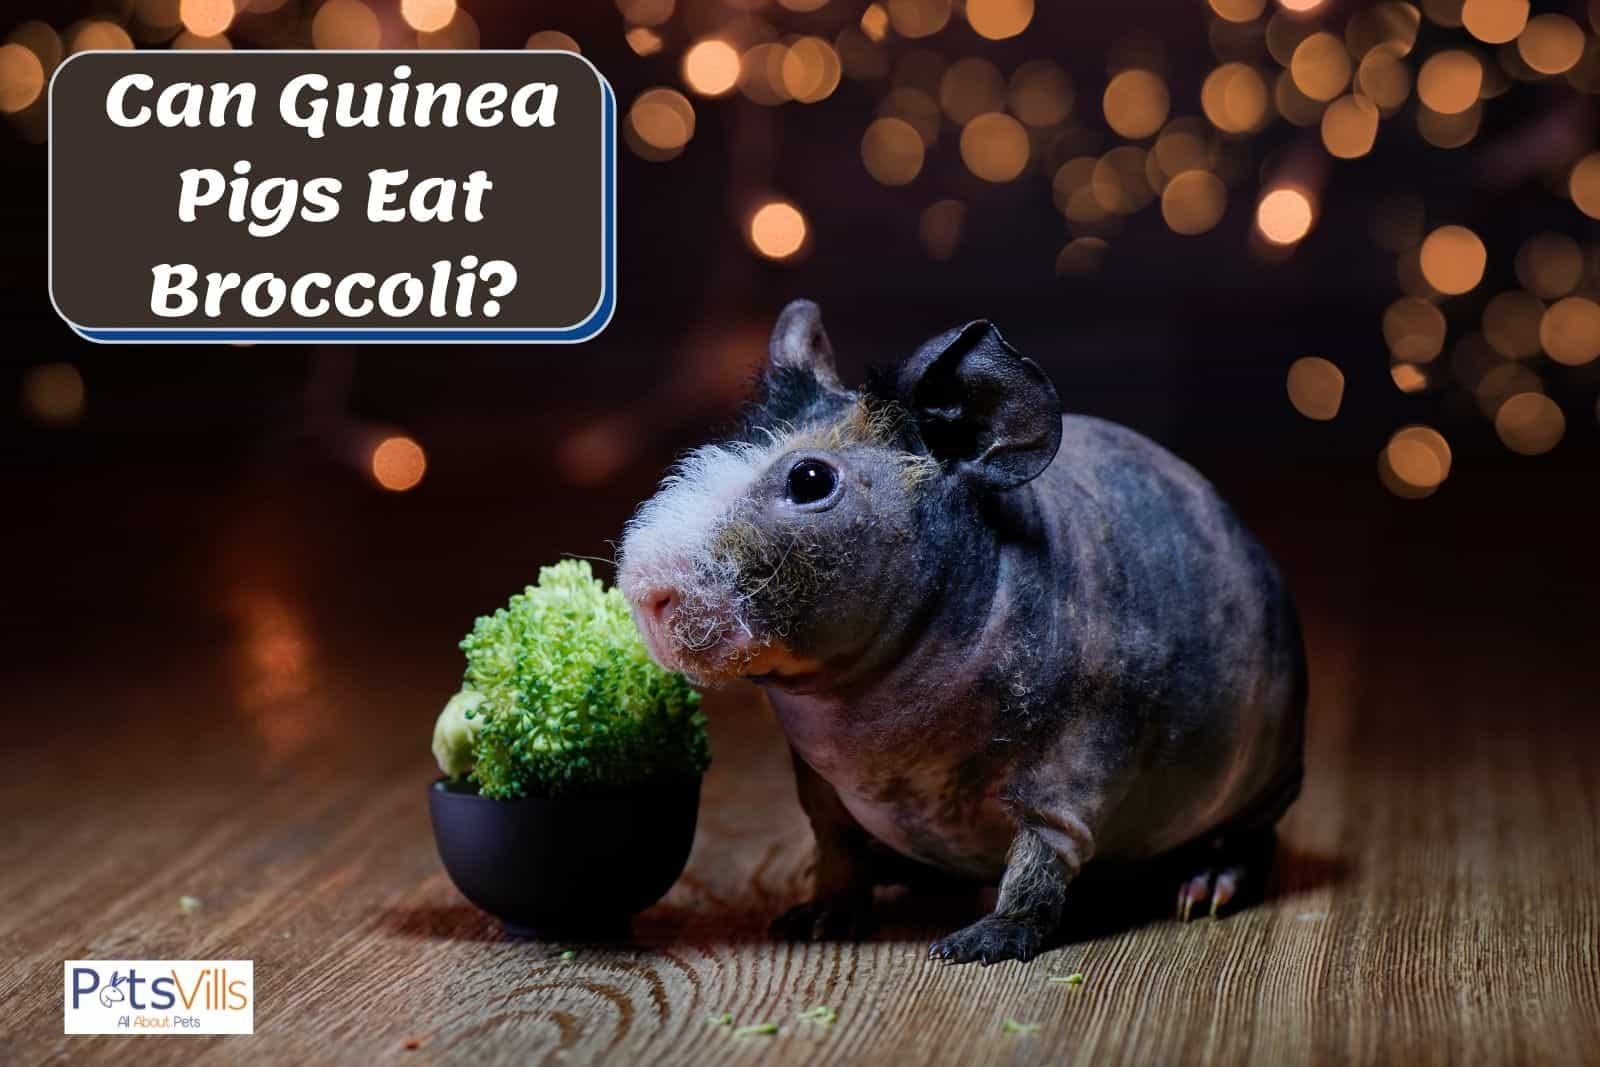 A bald guinea pig beside a broccoli. Can guinea pigs eat broccoli?